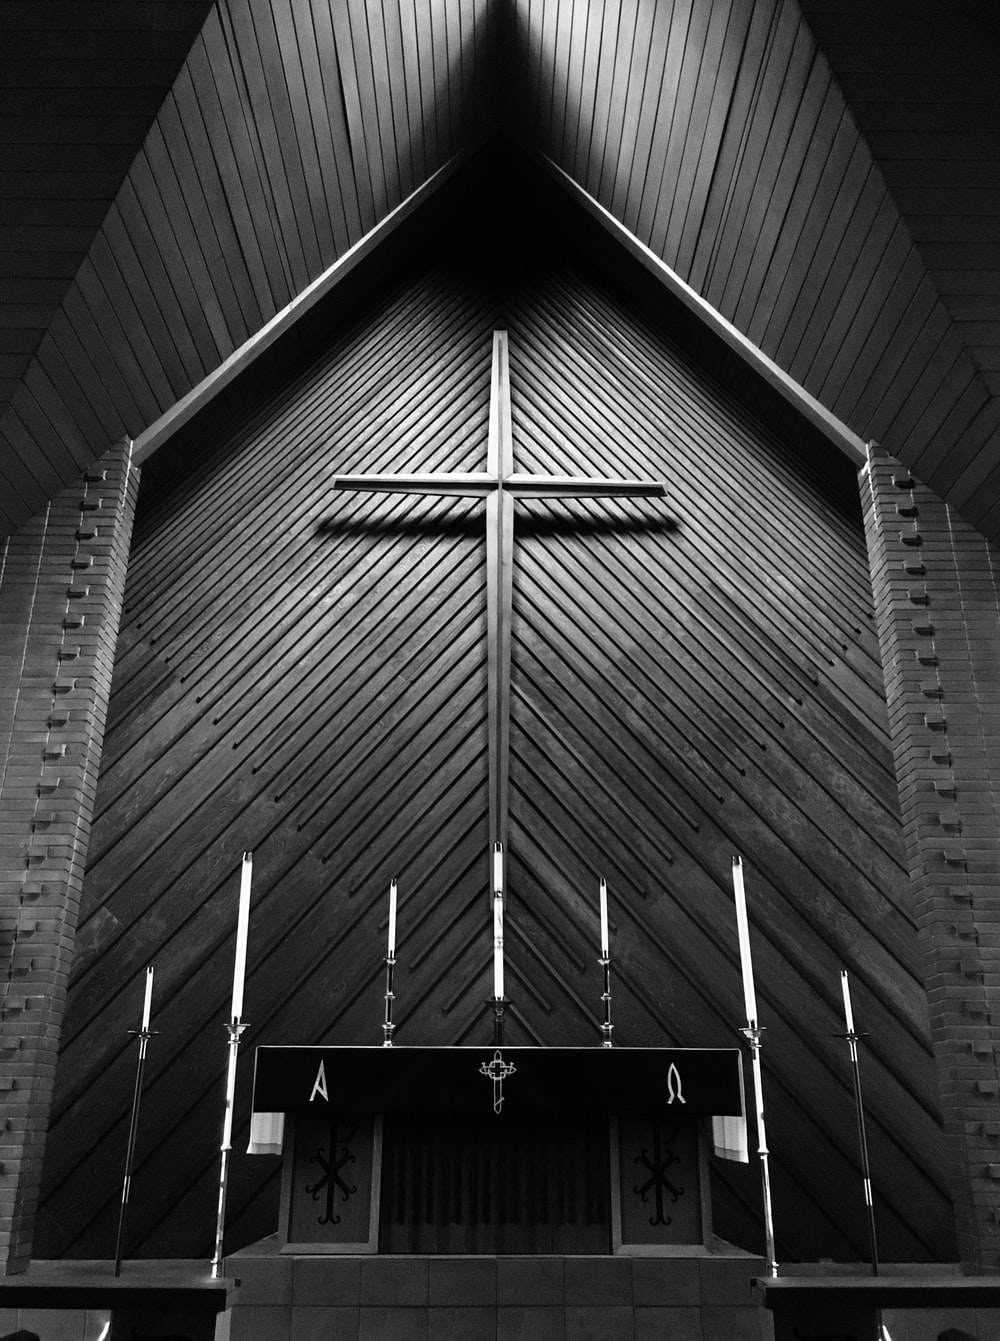 greyscale photography of church altar